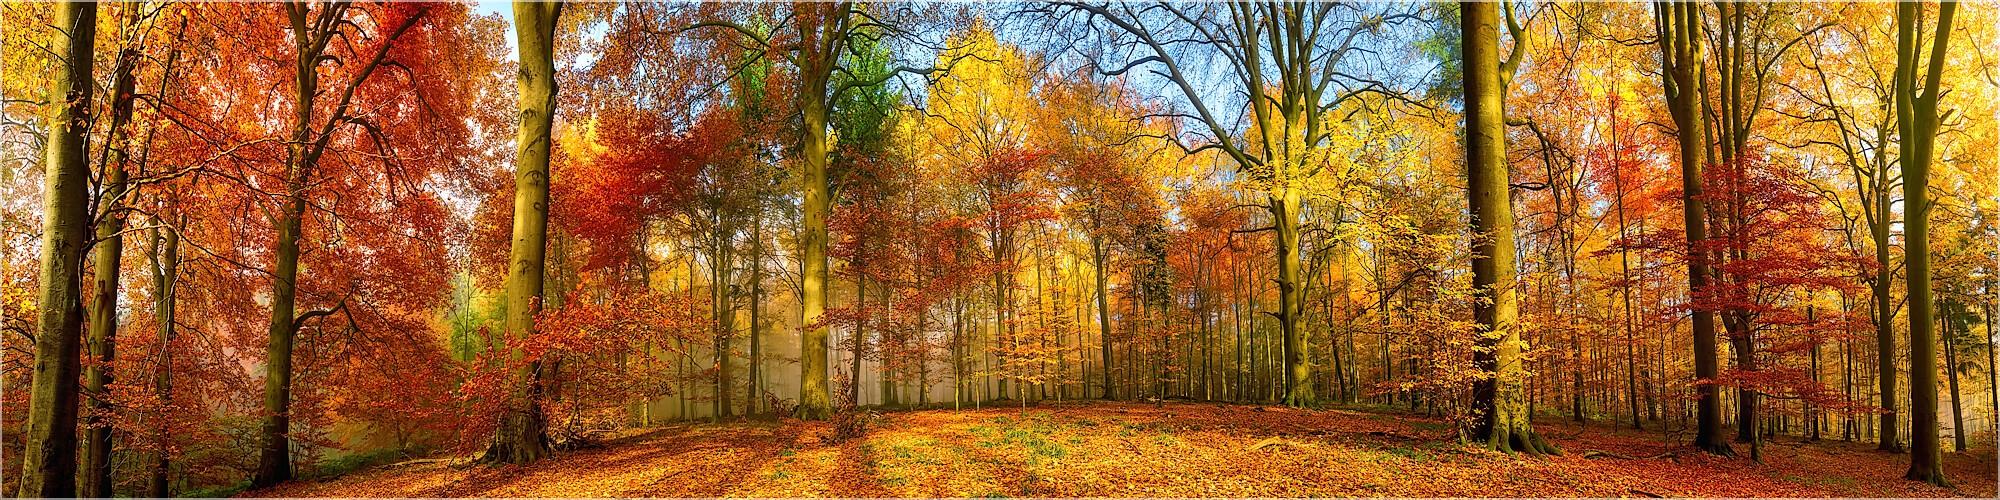 Panoramabild Leuchtender Herbstwald Indian Summer